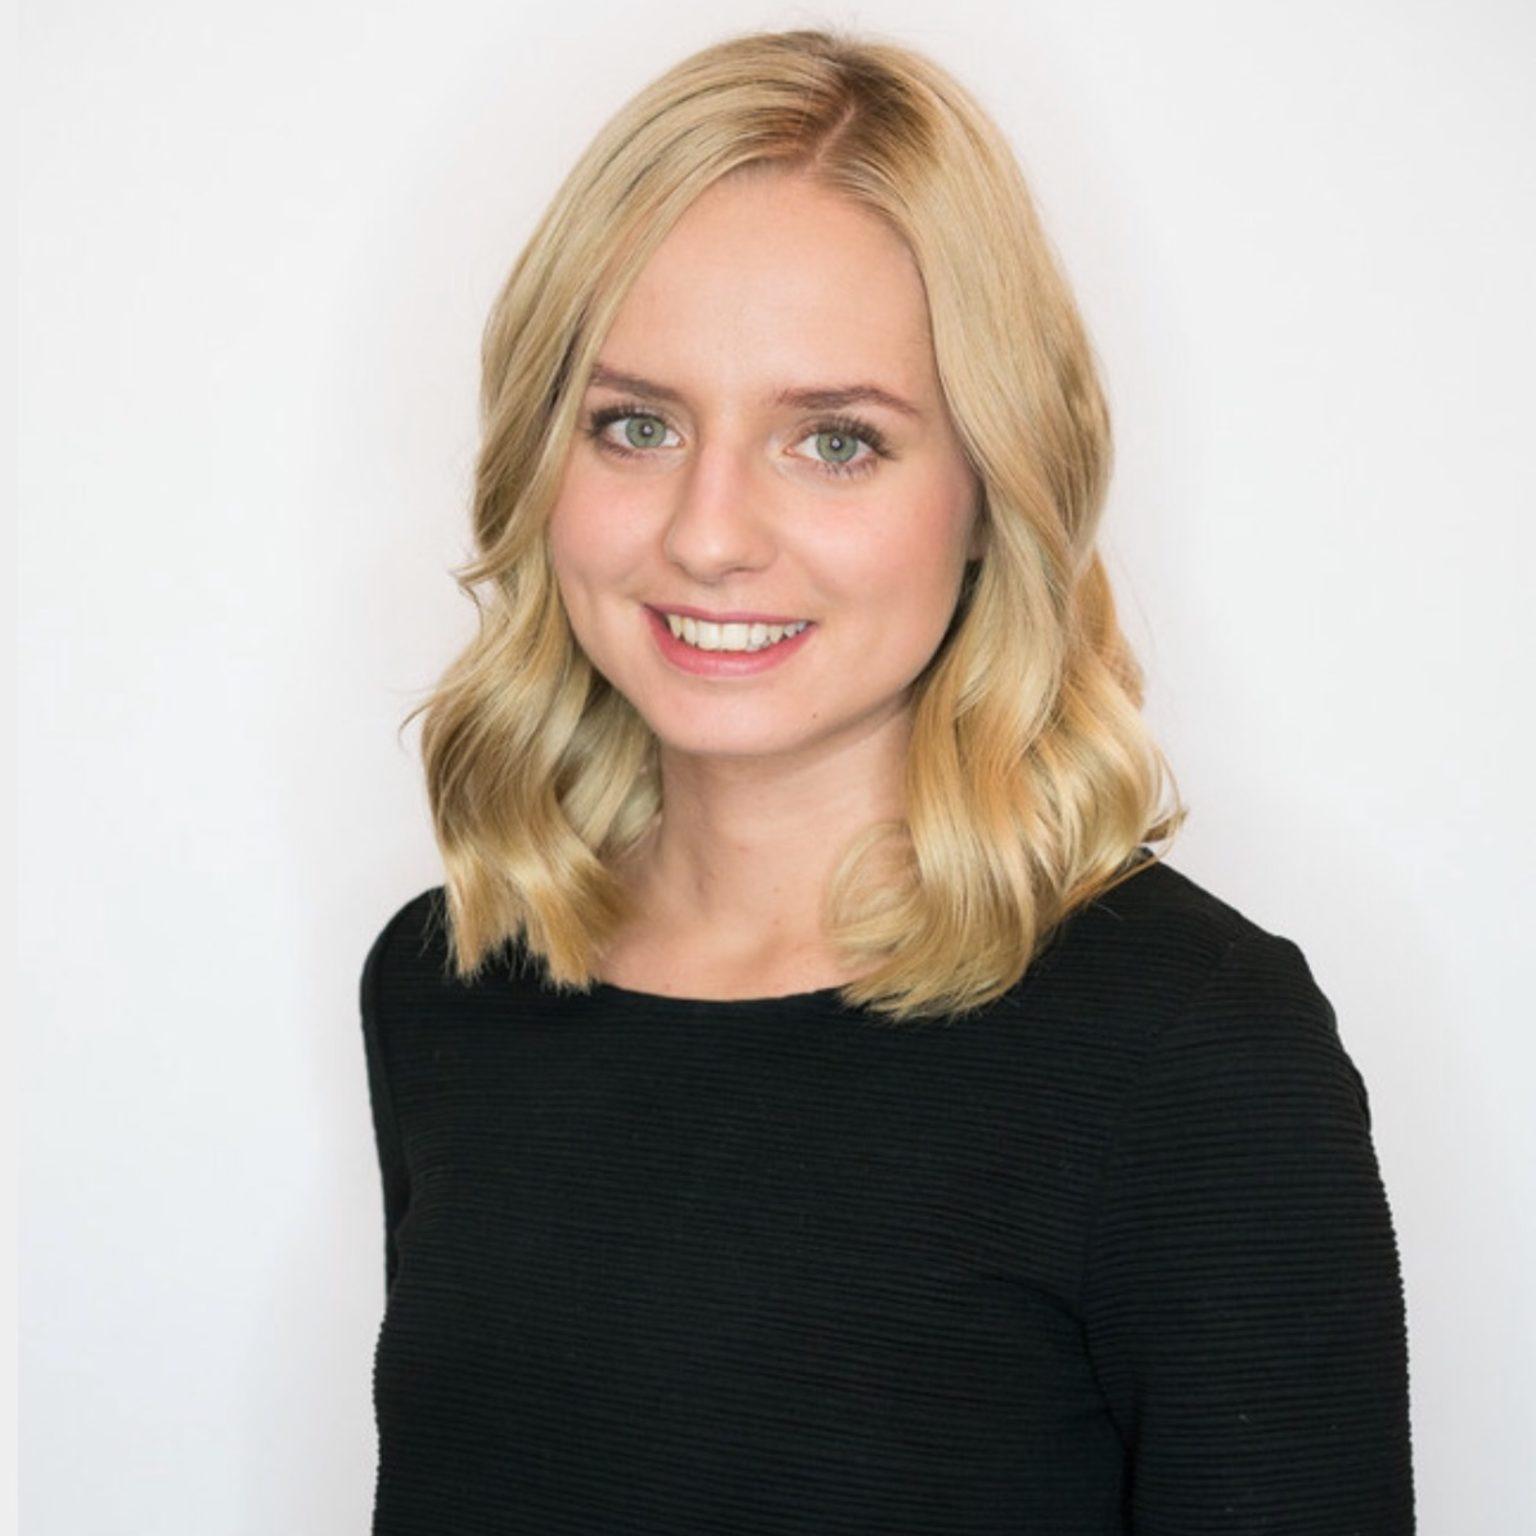 Fabienne - Haarstylistin - Spezialgebiet: Haarfarbe und Langes Haar